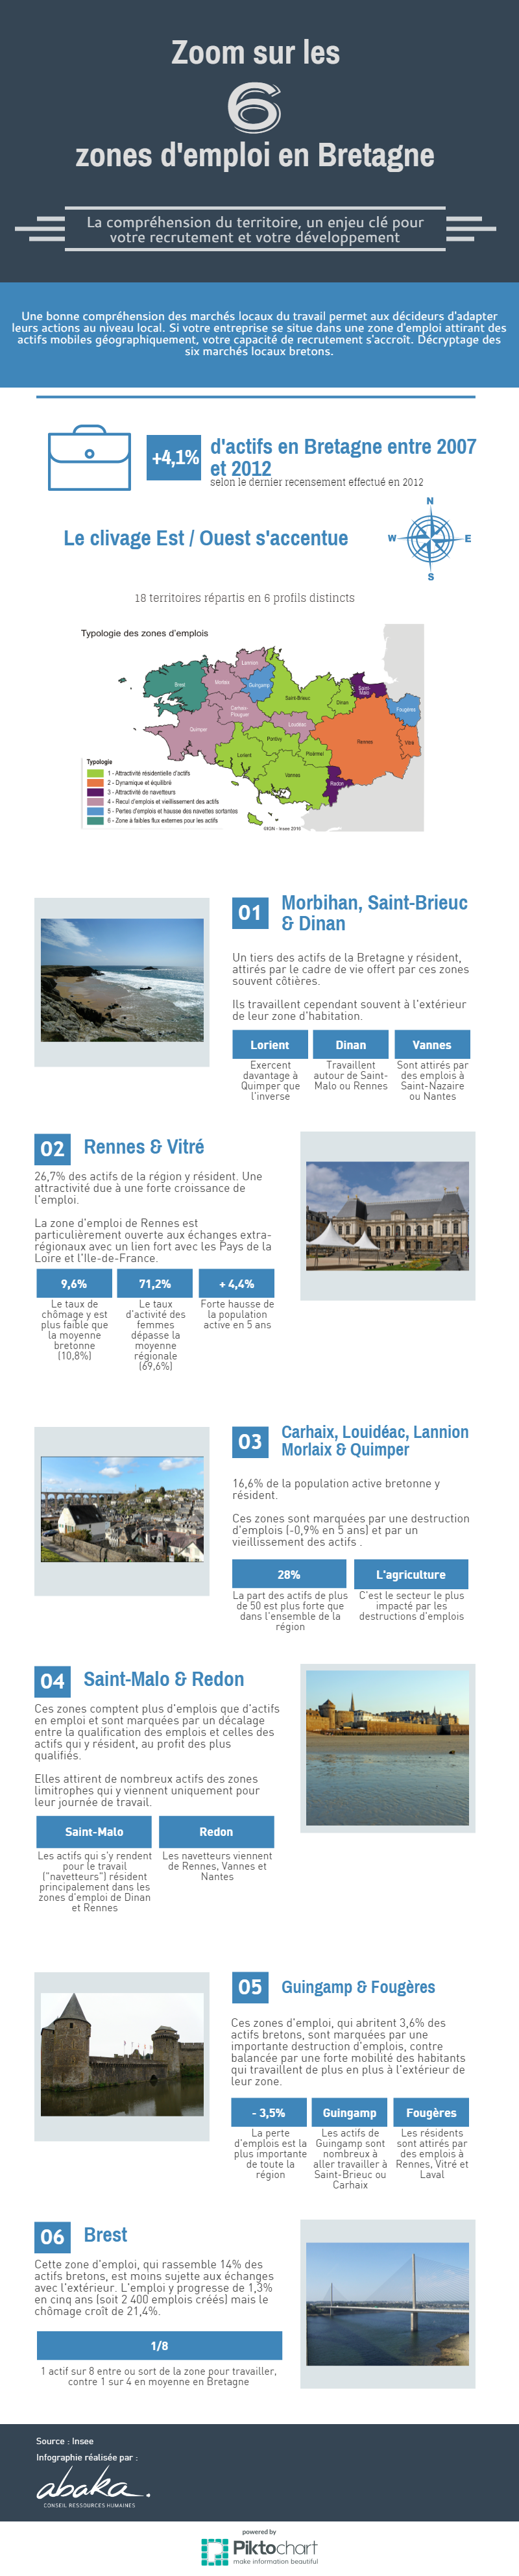 6 zones d'emploi en Bretagne - Taille originale